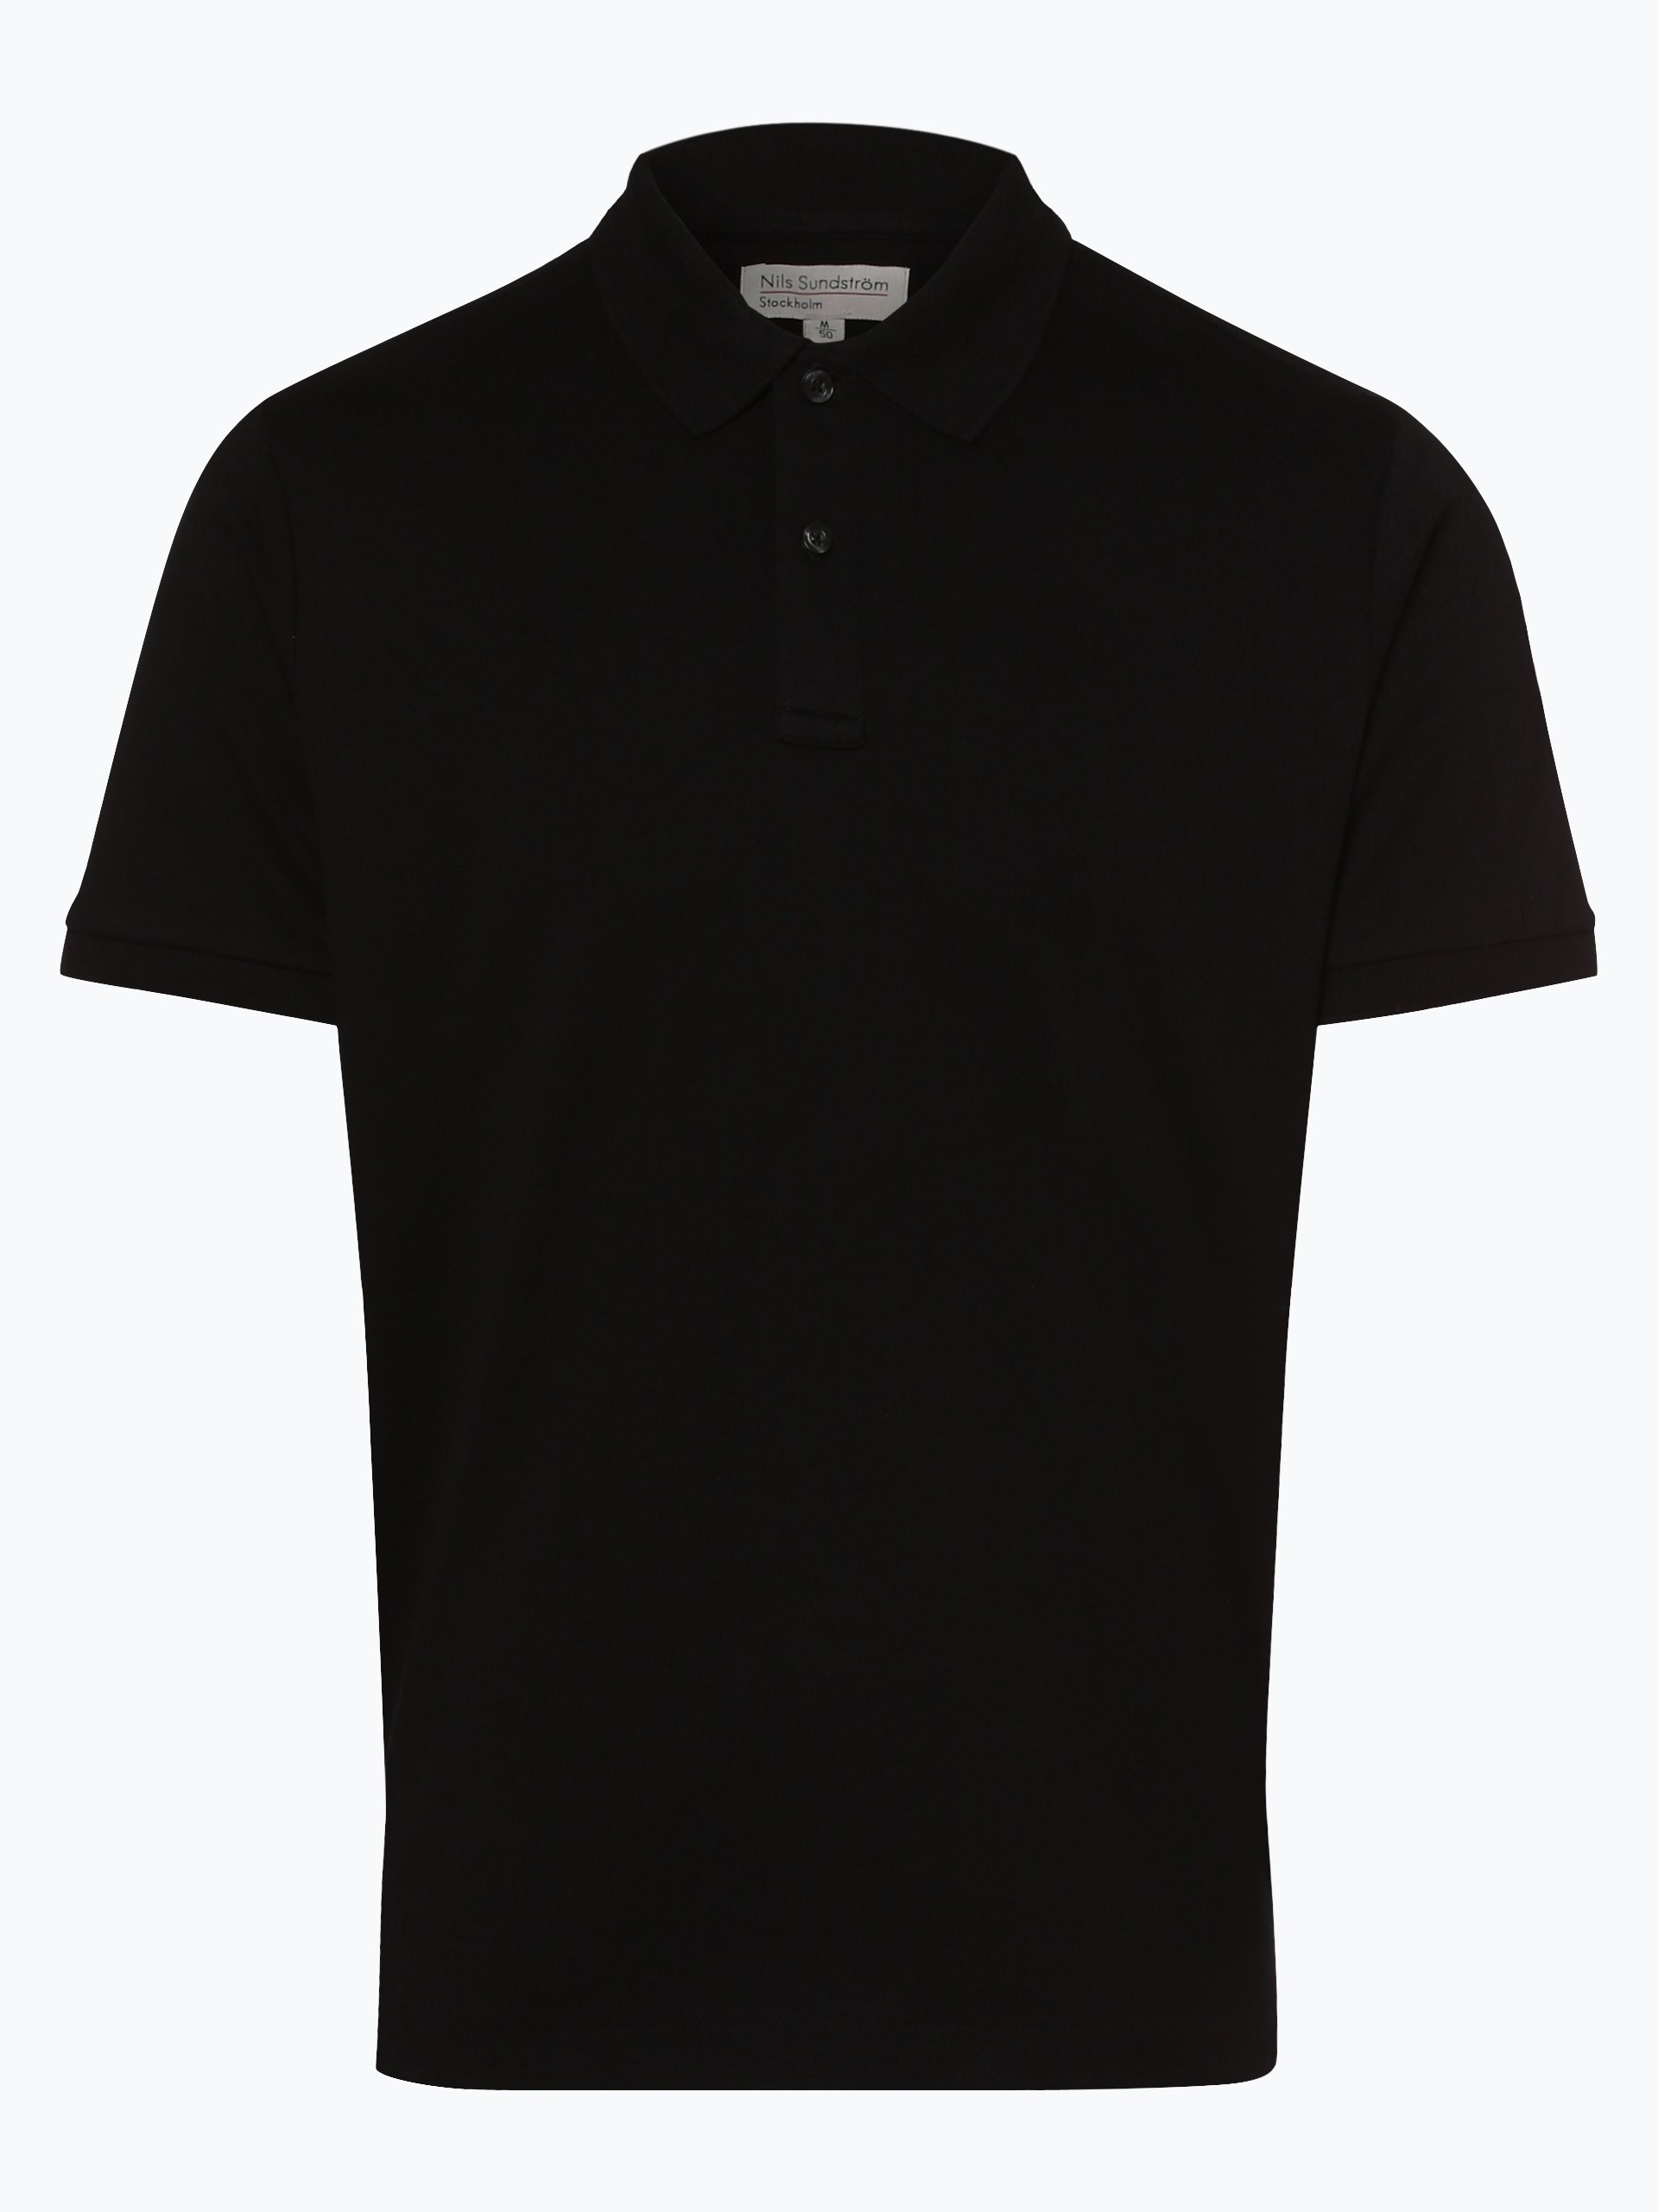 Nils Sundström Herren Poloshirt